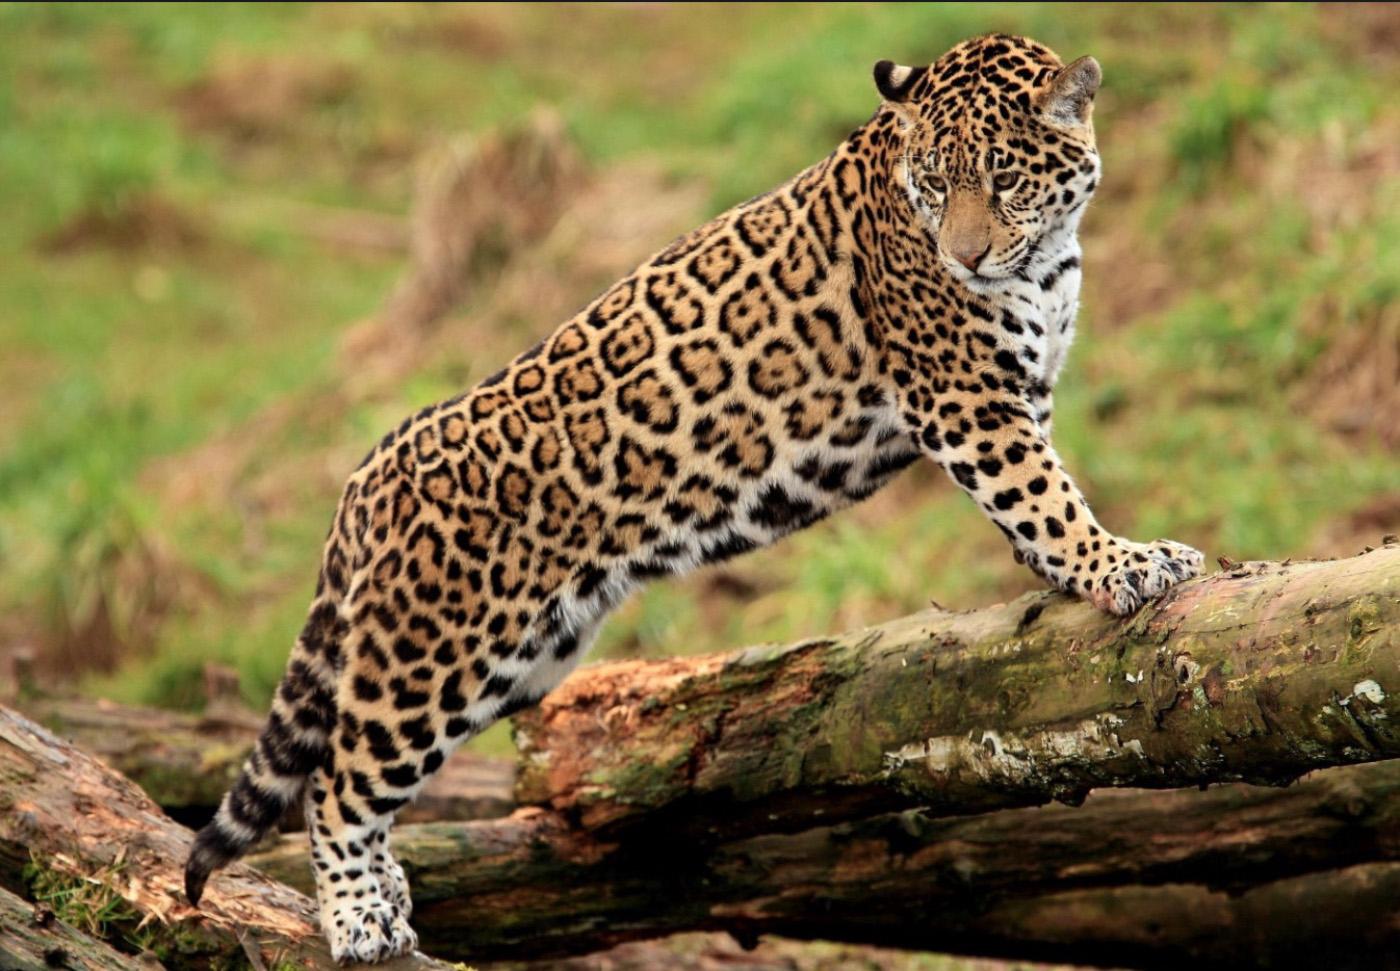 jaguar_lj_4.jpg